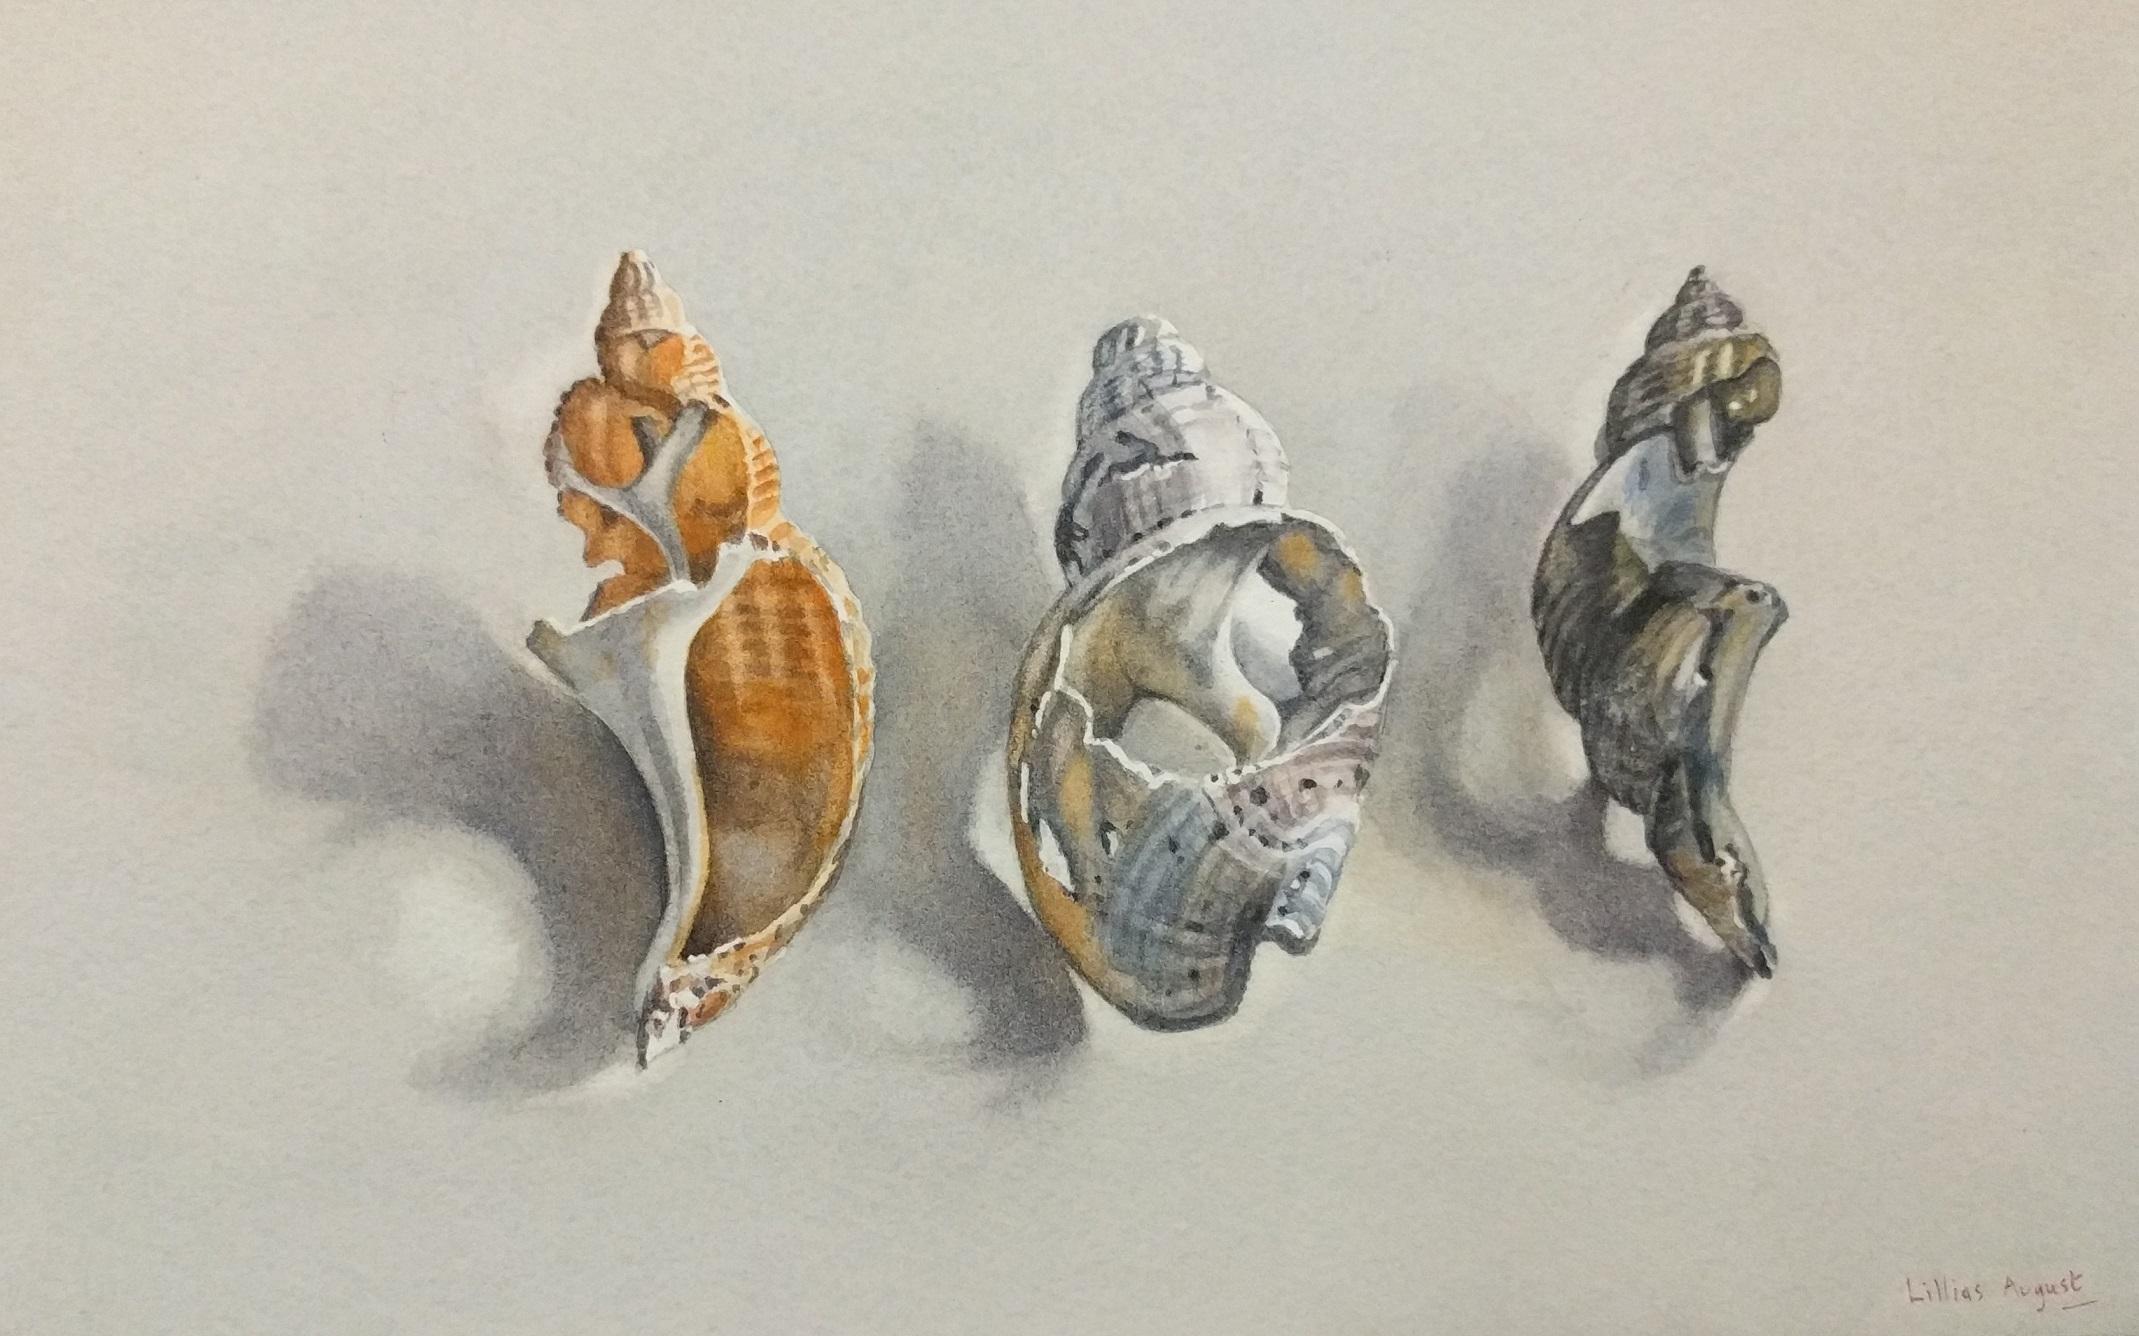 Lillias August Three Broken Shells, Watercolour on paper 23 x 15 cm.